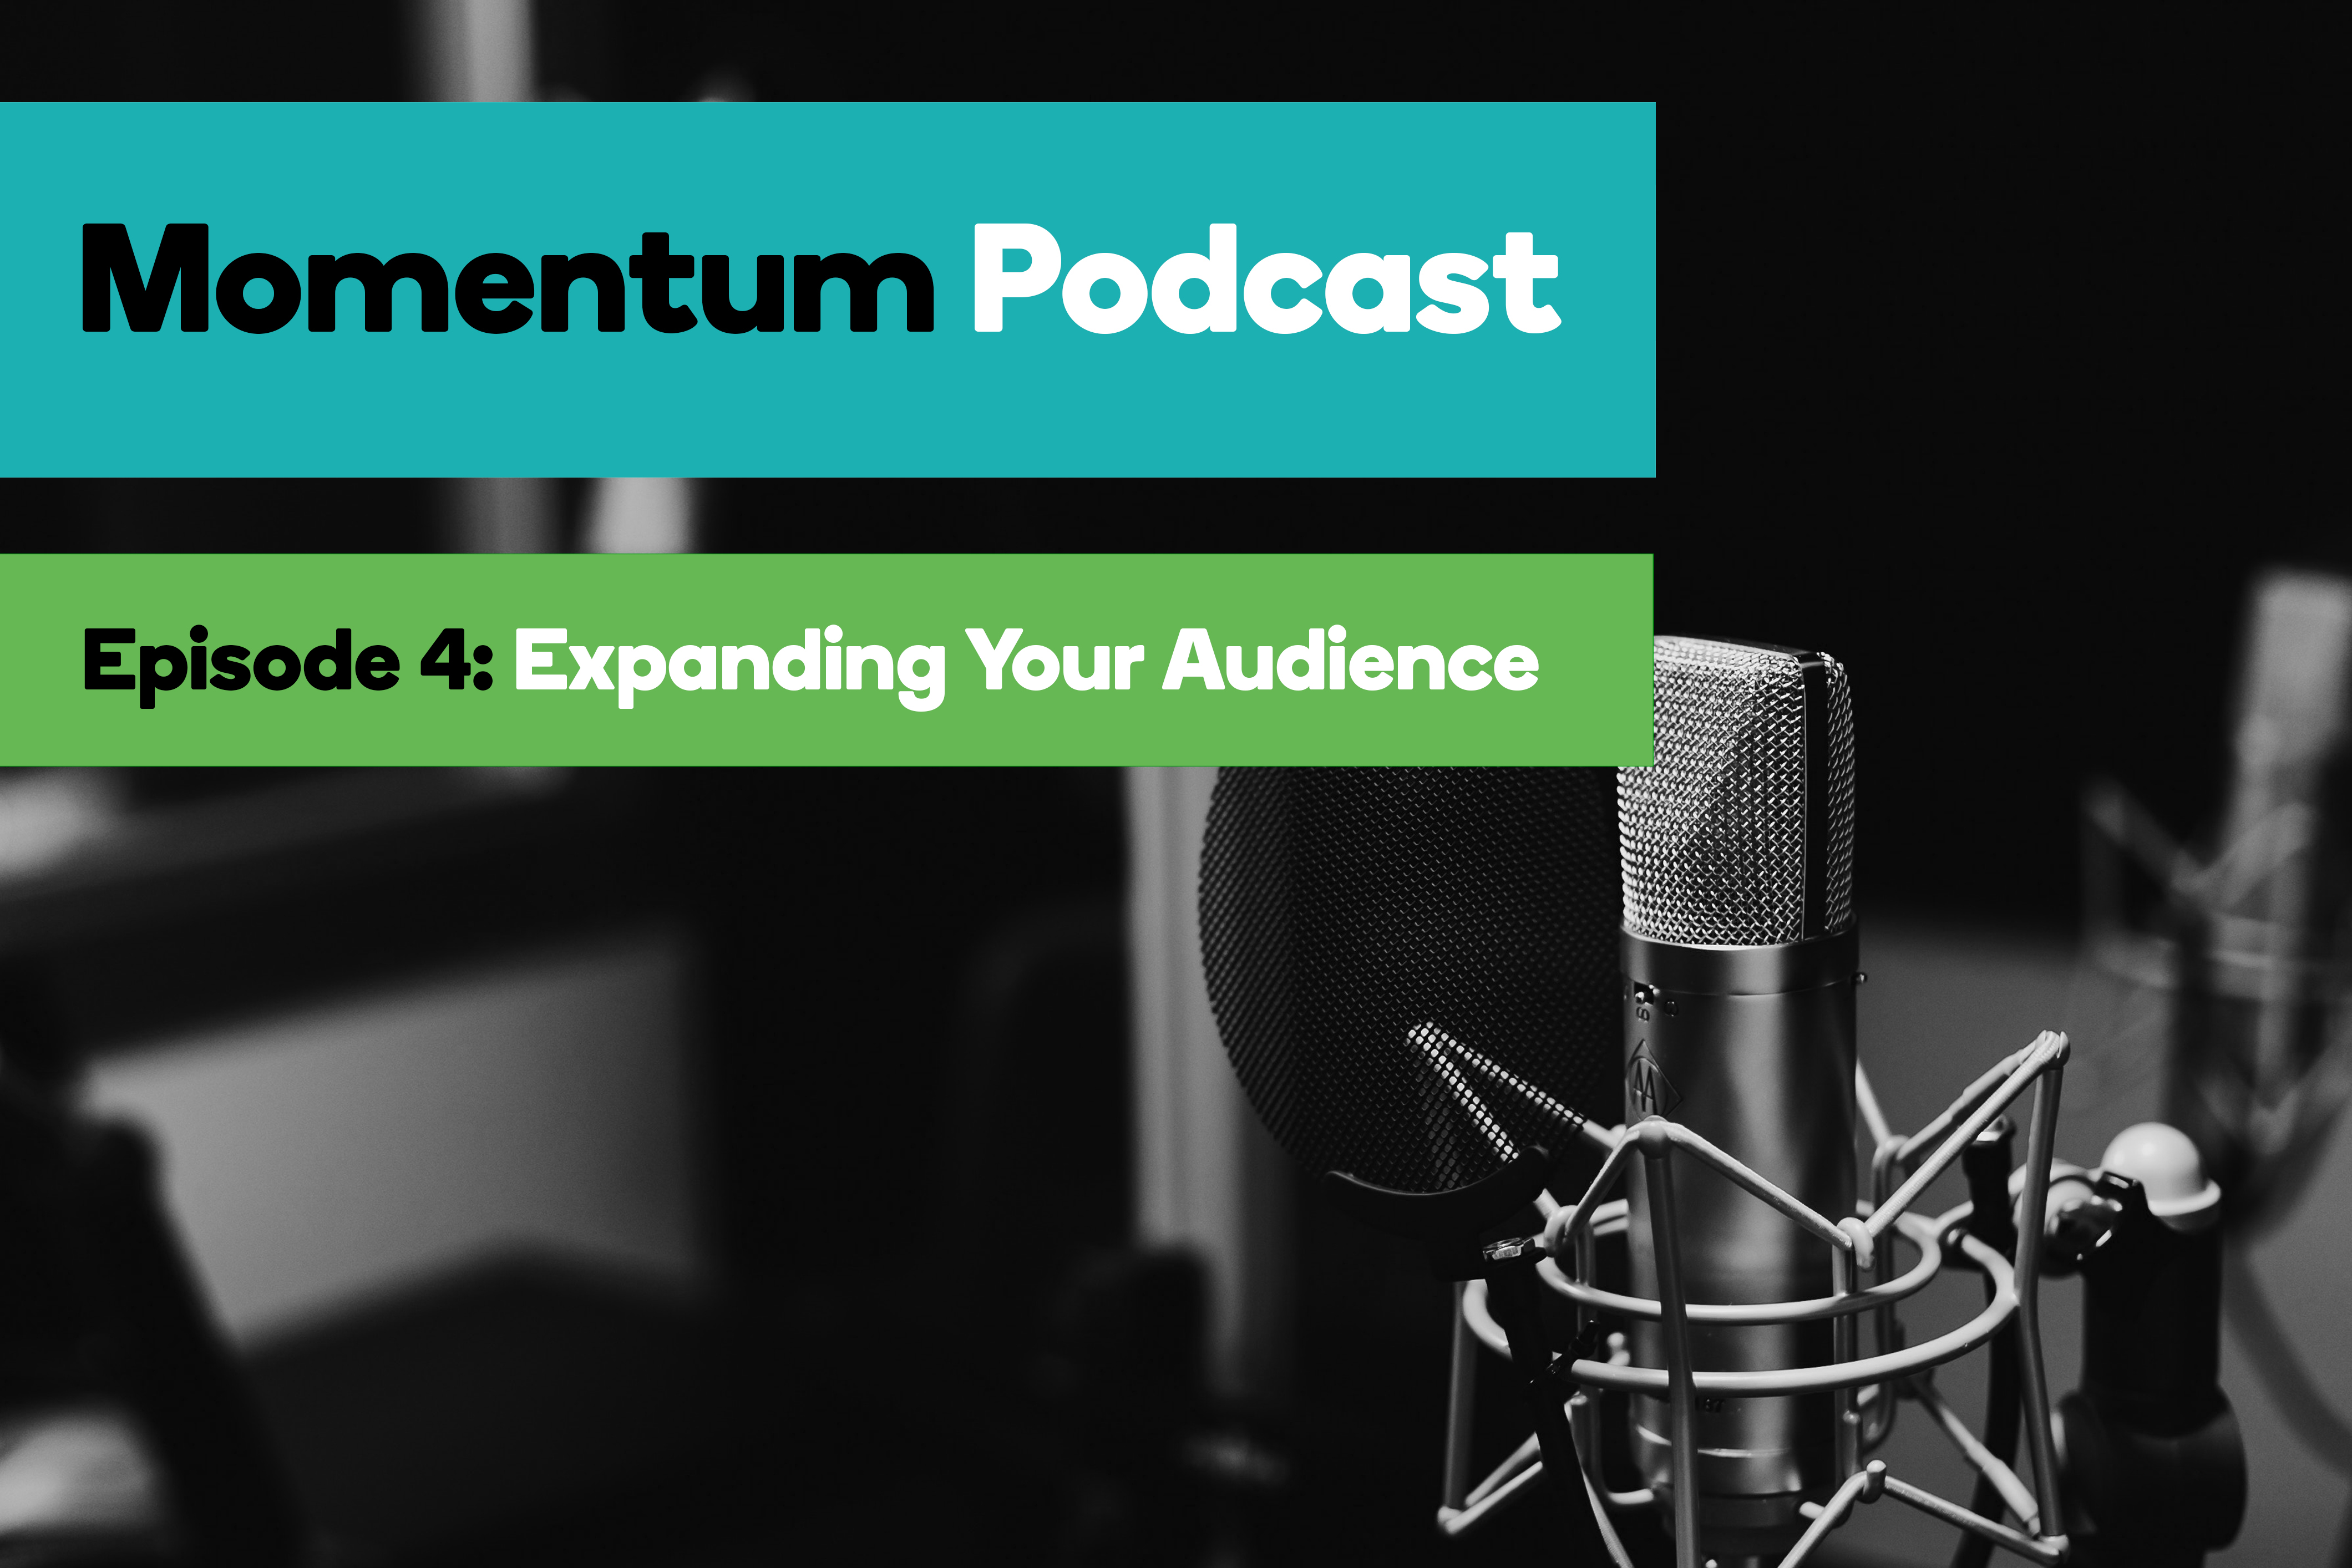 Flywheel momentum podcast